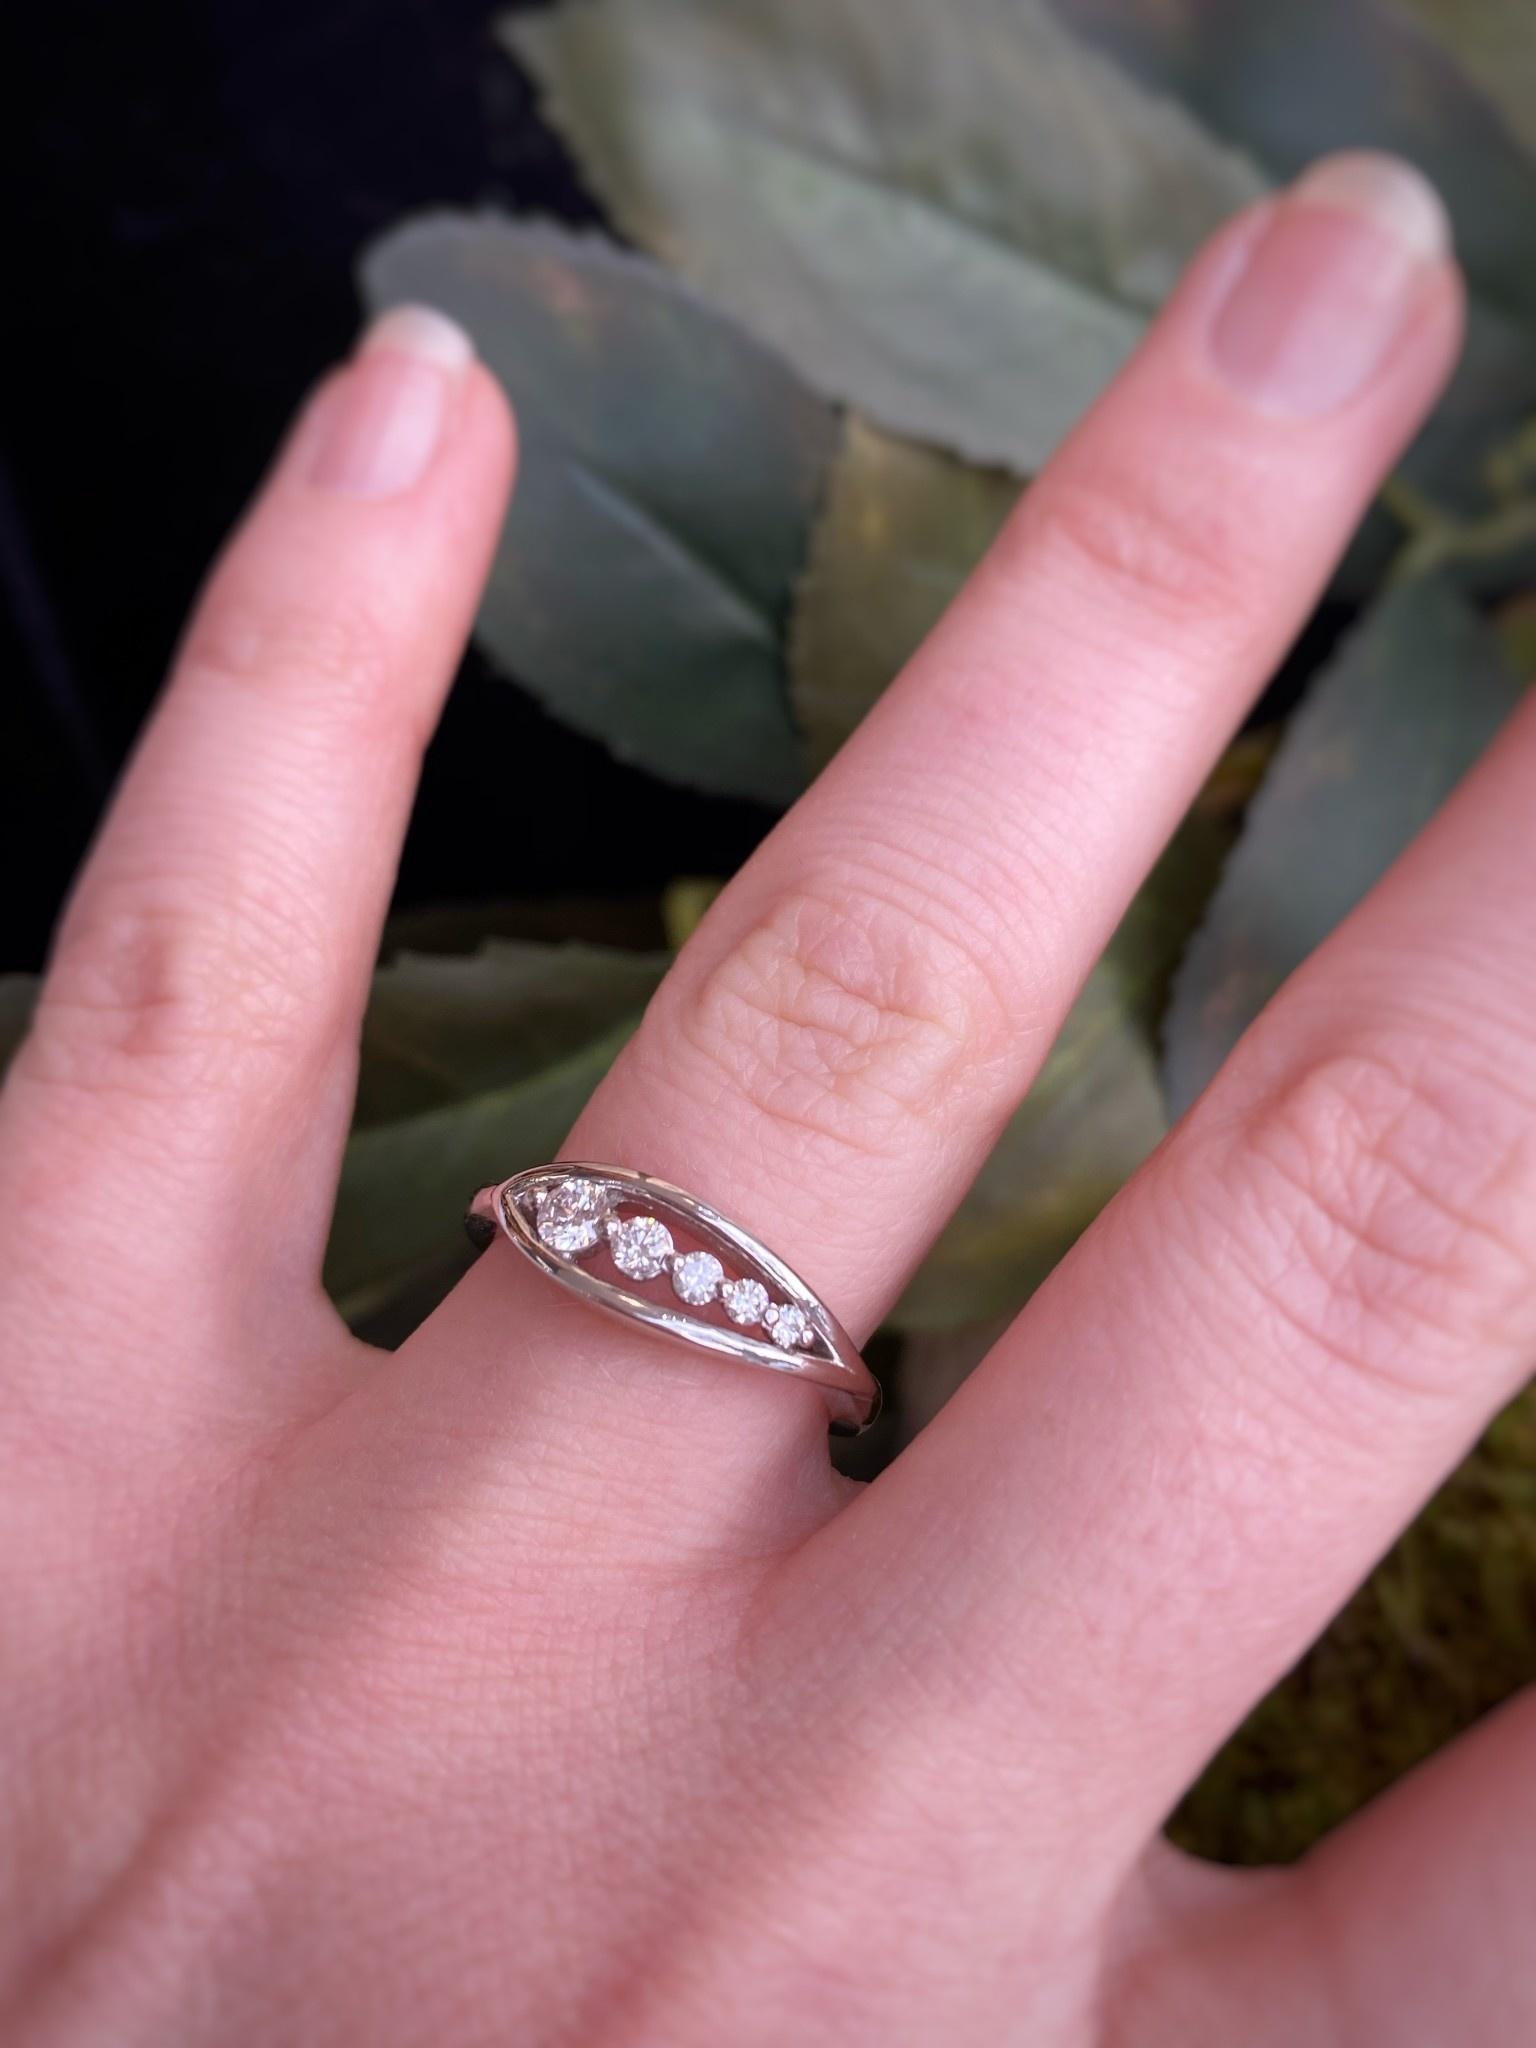 14K White Gold Five Diamond Ring